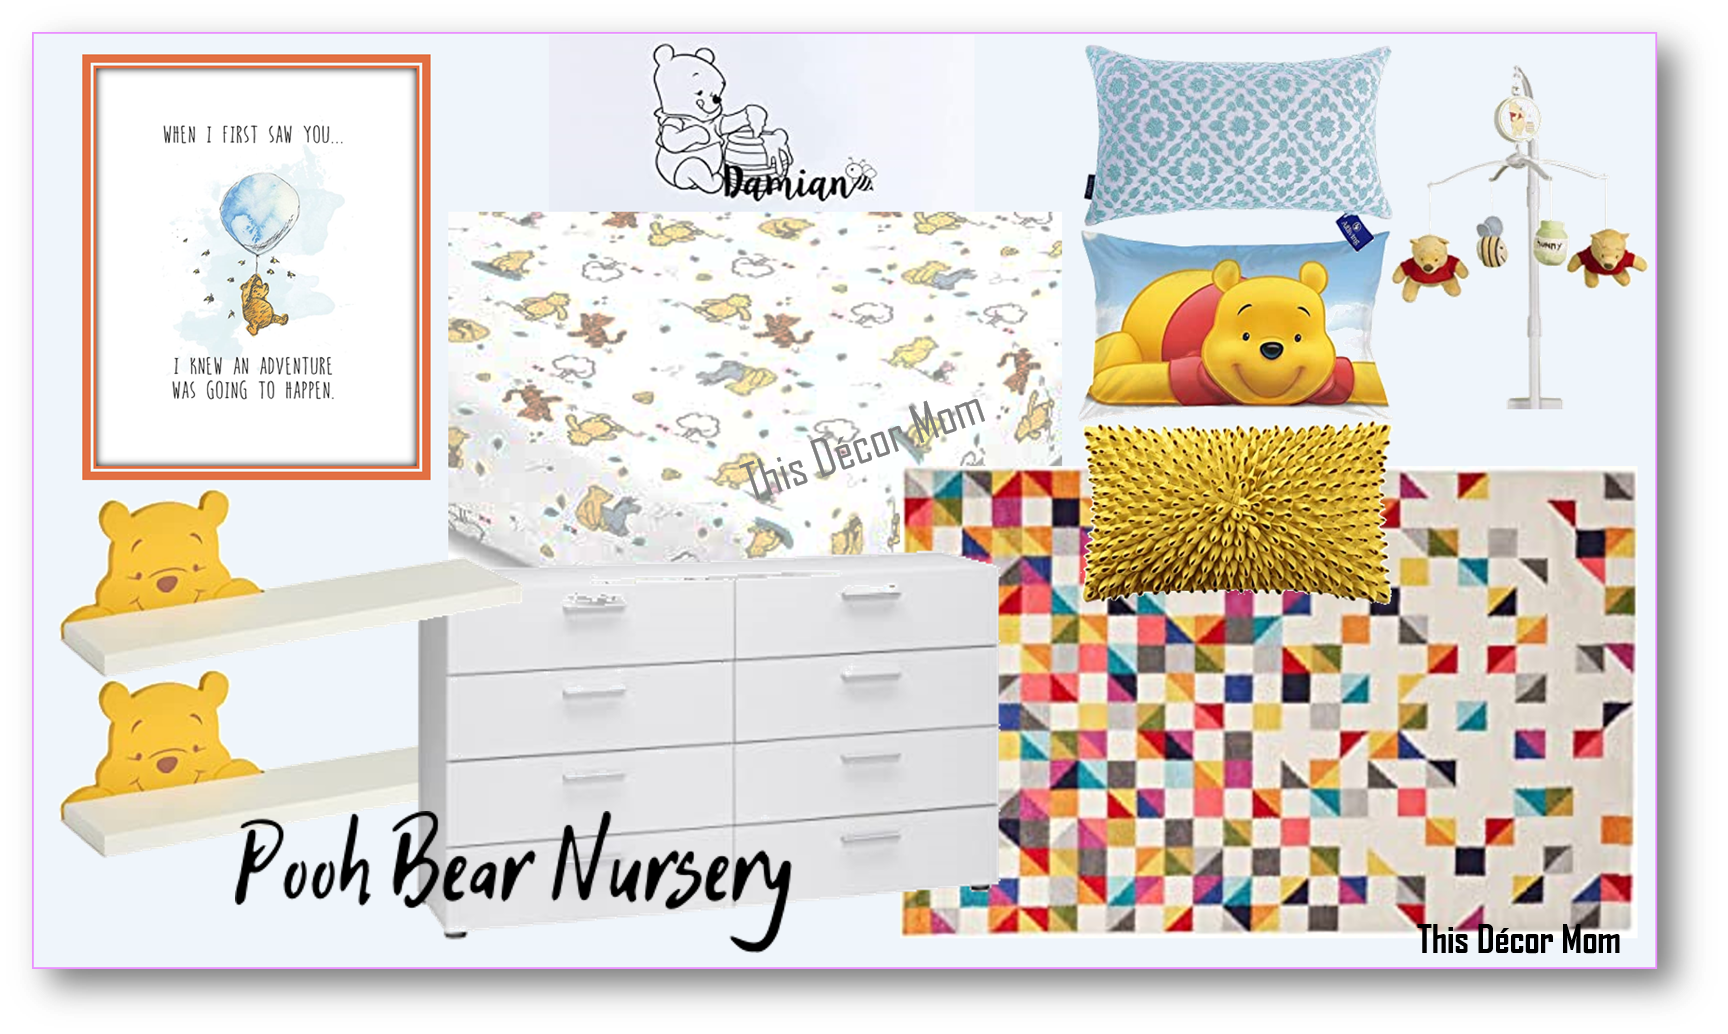 Vision Board 2 - Winnie the Pooh Nursery